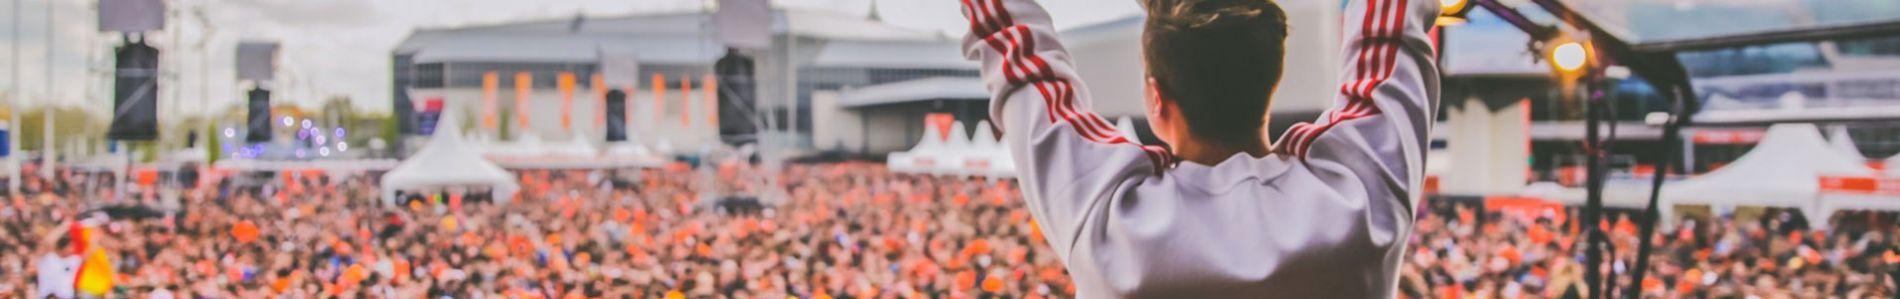 Win festival tickets + a meet and greet with Blasterjaxx